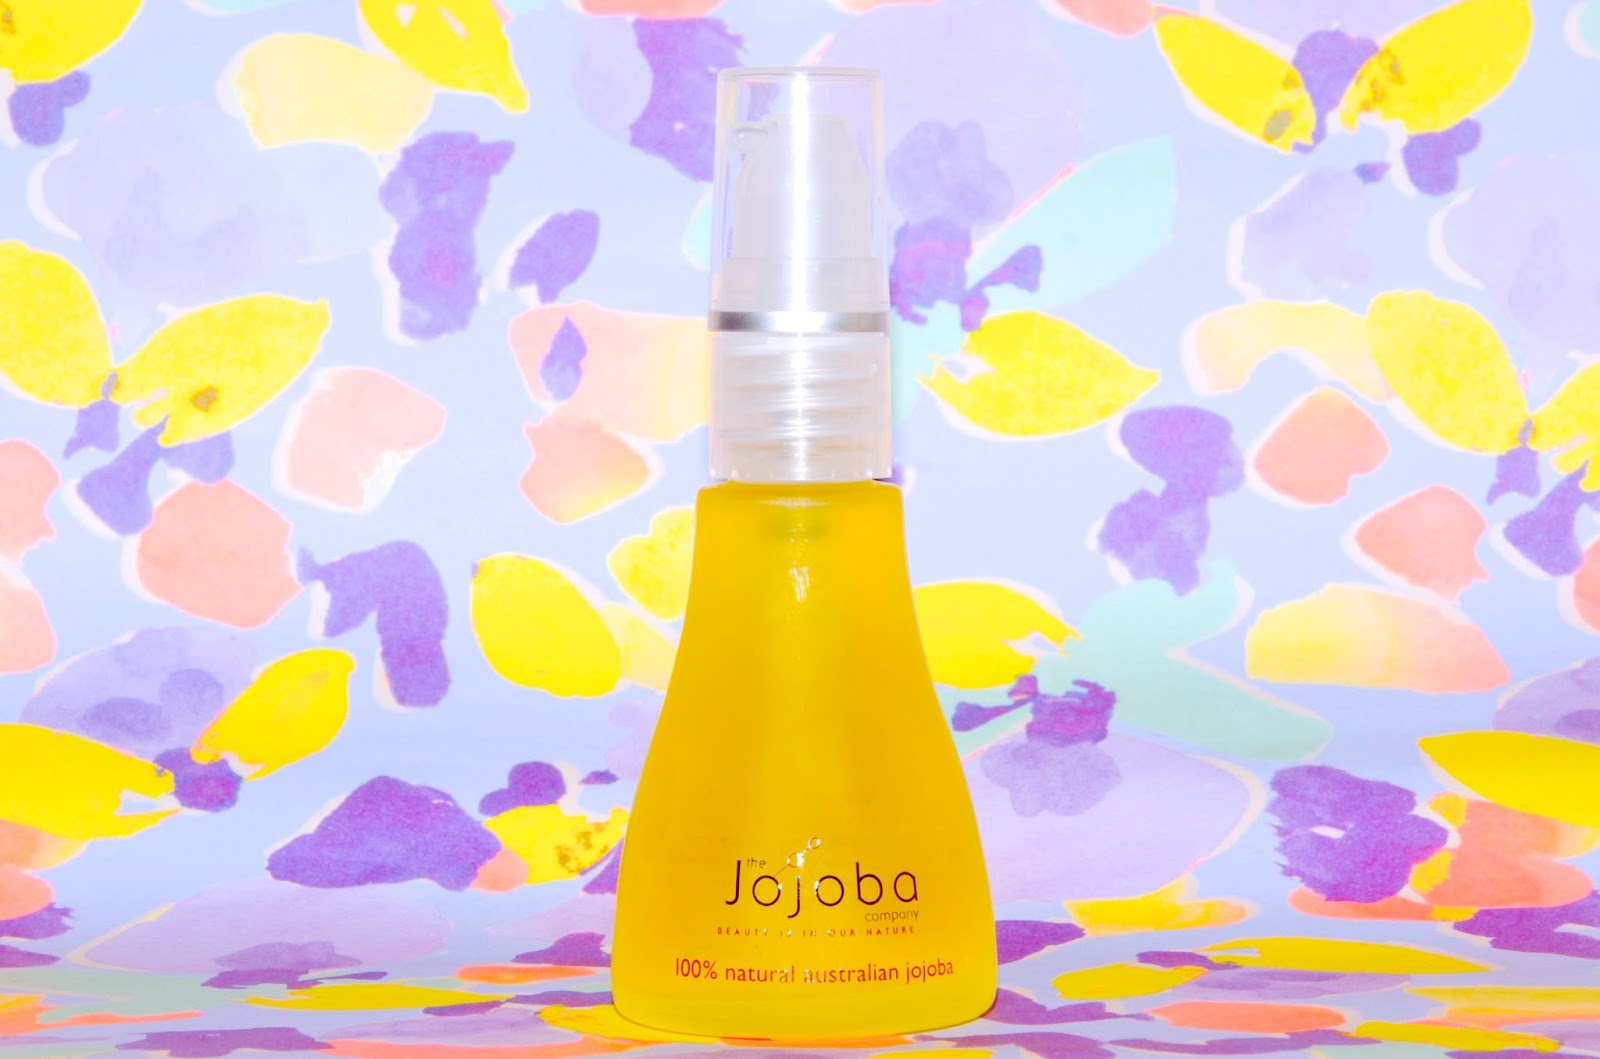 The Jojoba Company 100% Natural Australian Jojoba Oil